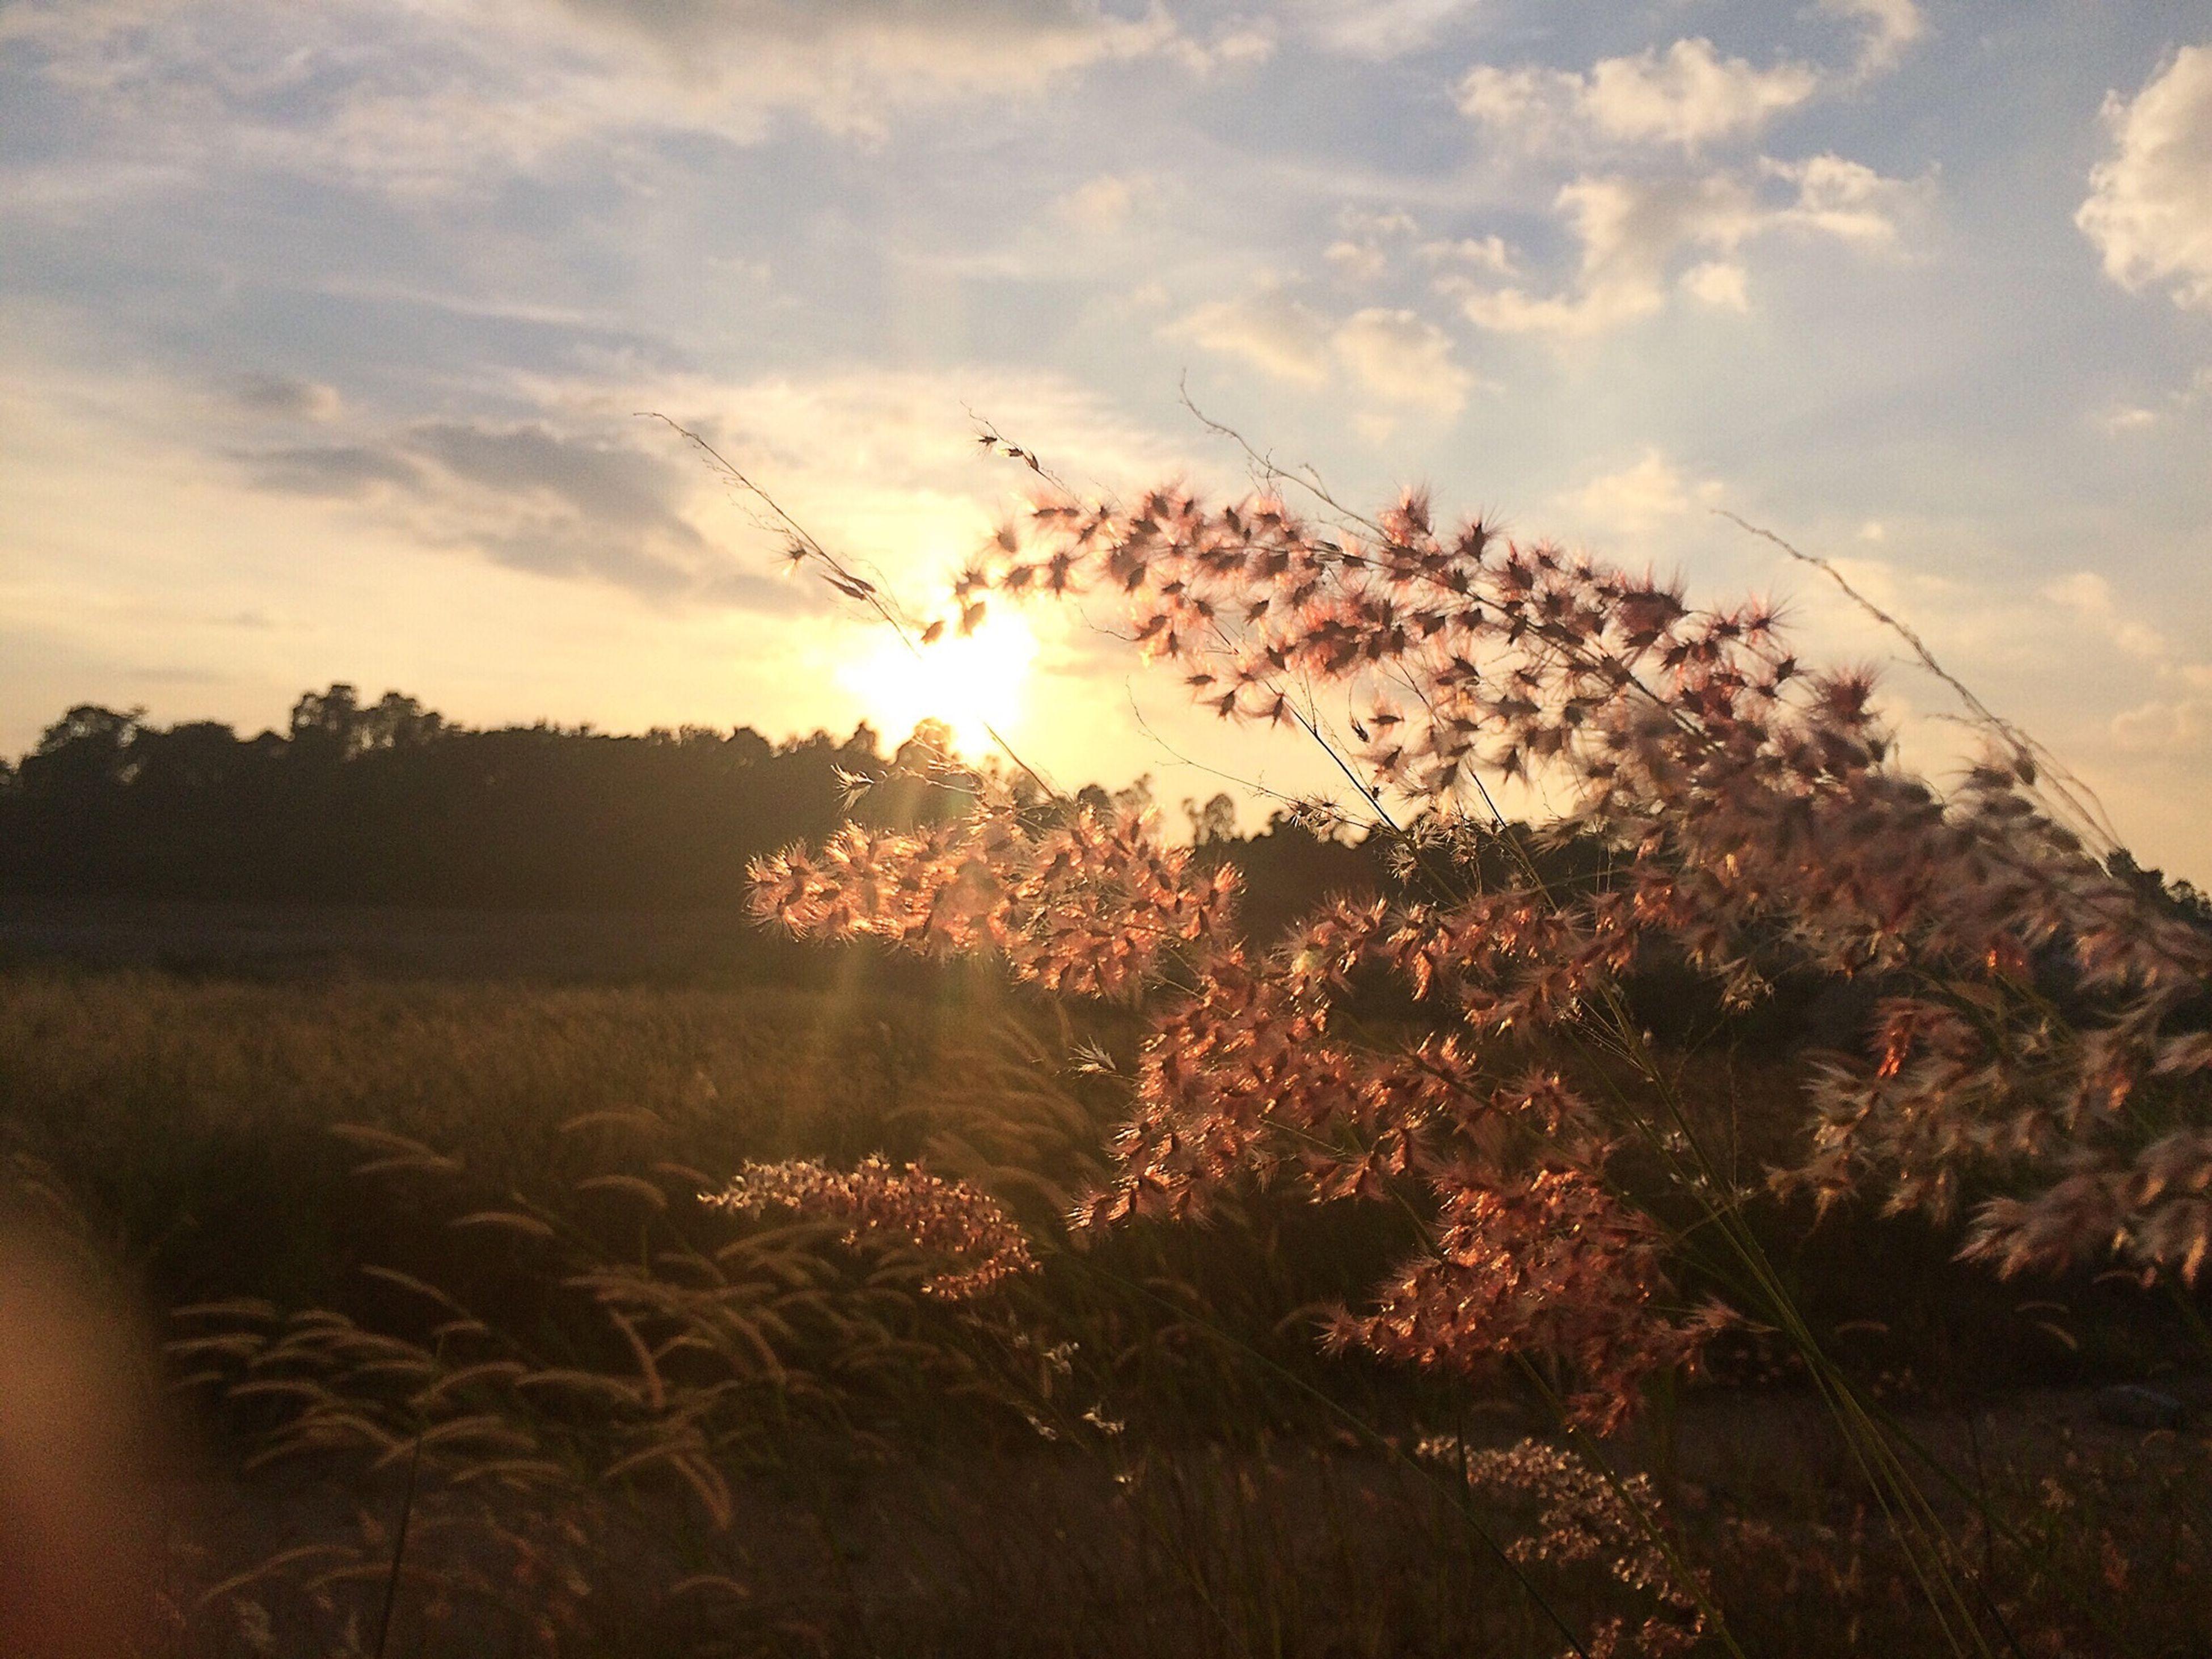 sun, sunset, sky, tranquil scene, beauty in nature, scenics, tranquility, sunlight, nature, tree, silhouette, sunbeam, cloud - sky, growth, plant, bird, landscape, orange color, idyllic, lens flare